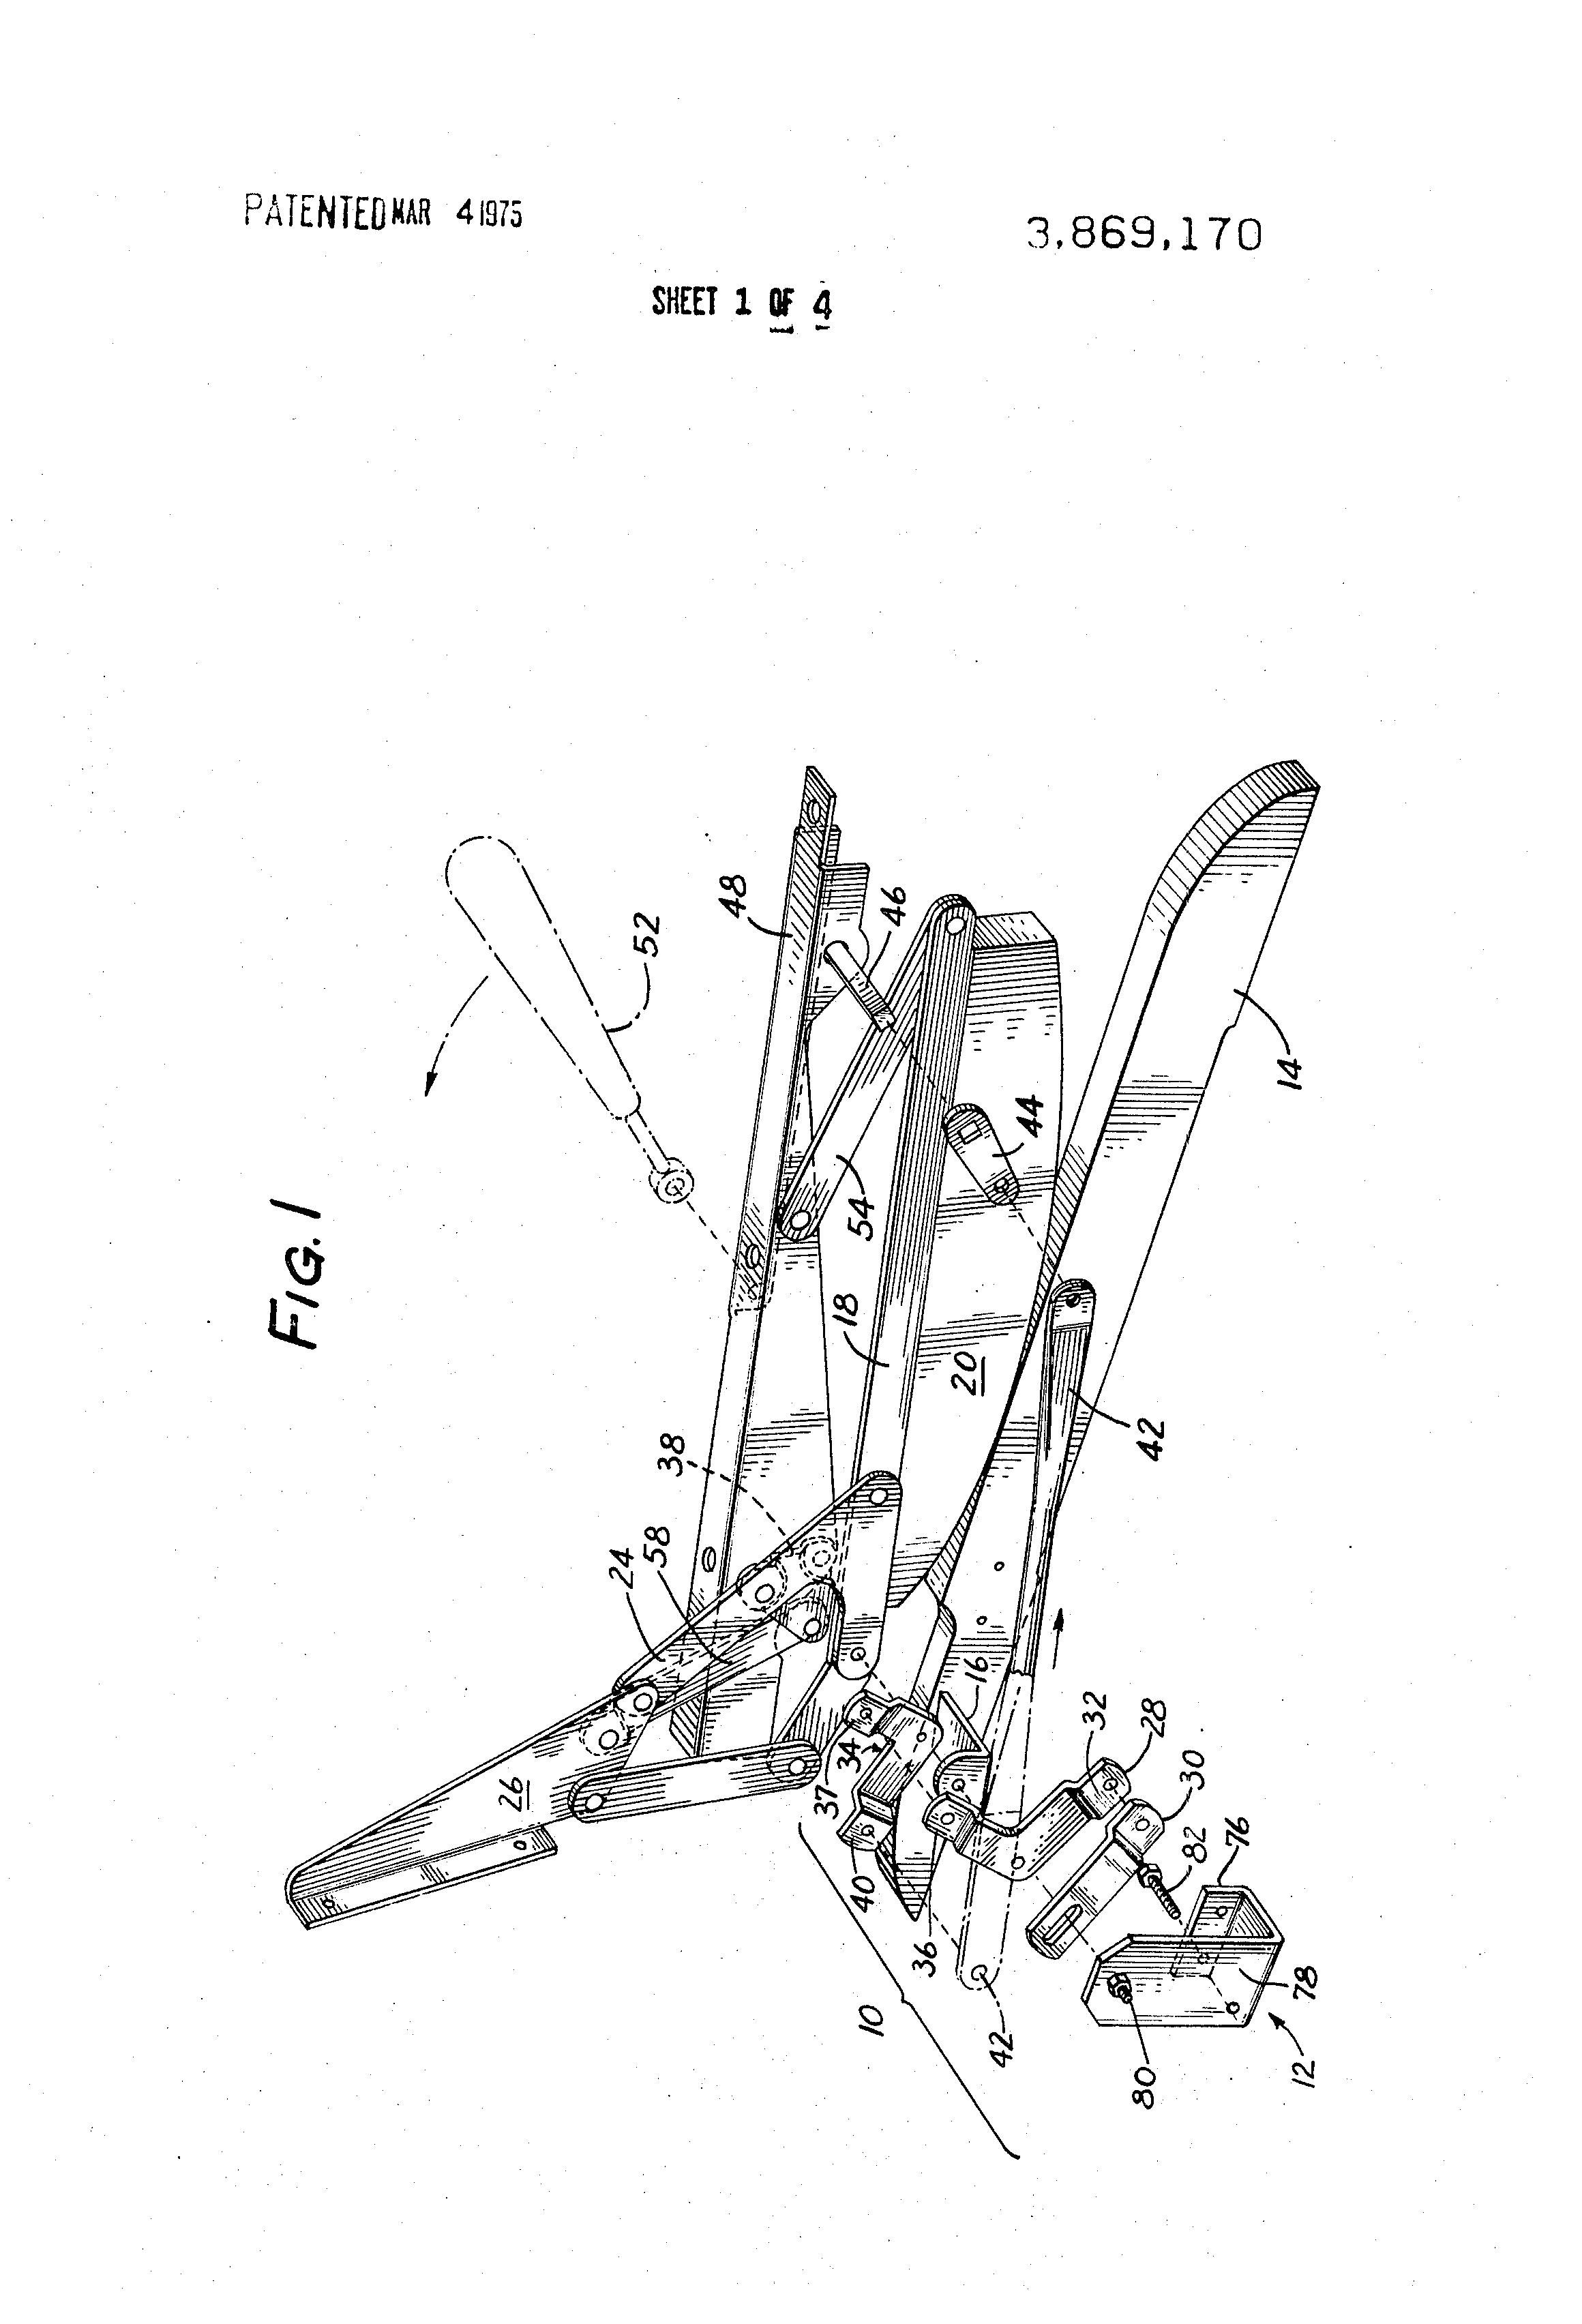 US3869170